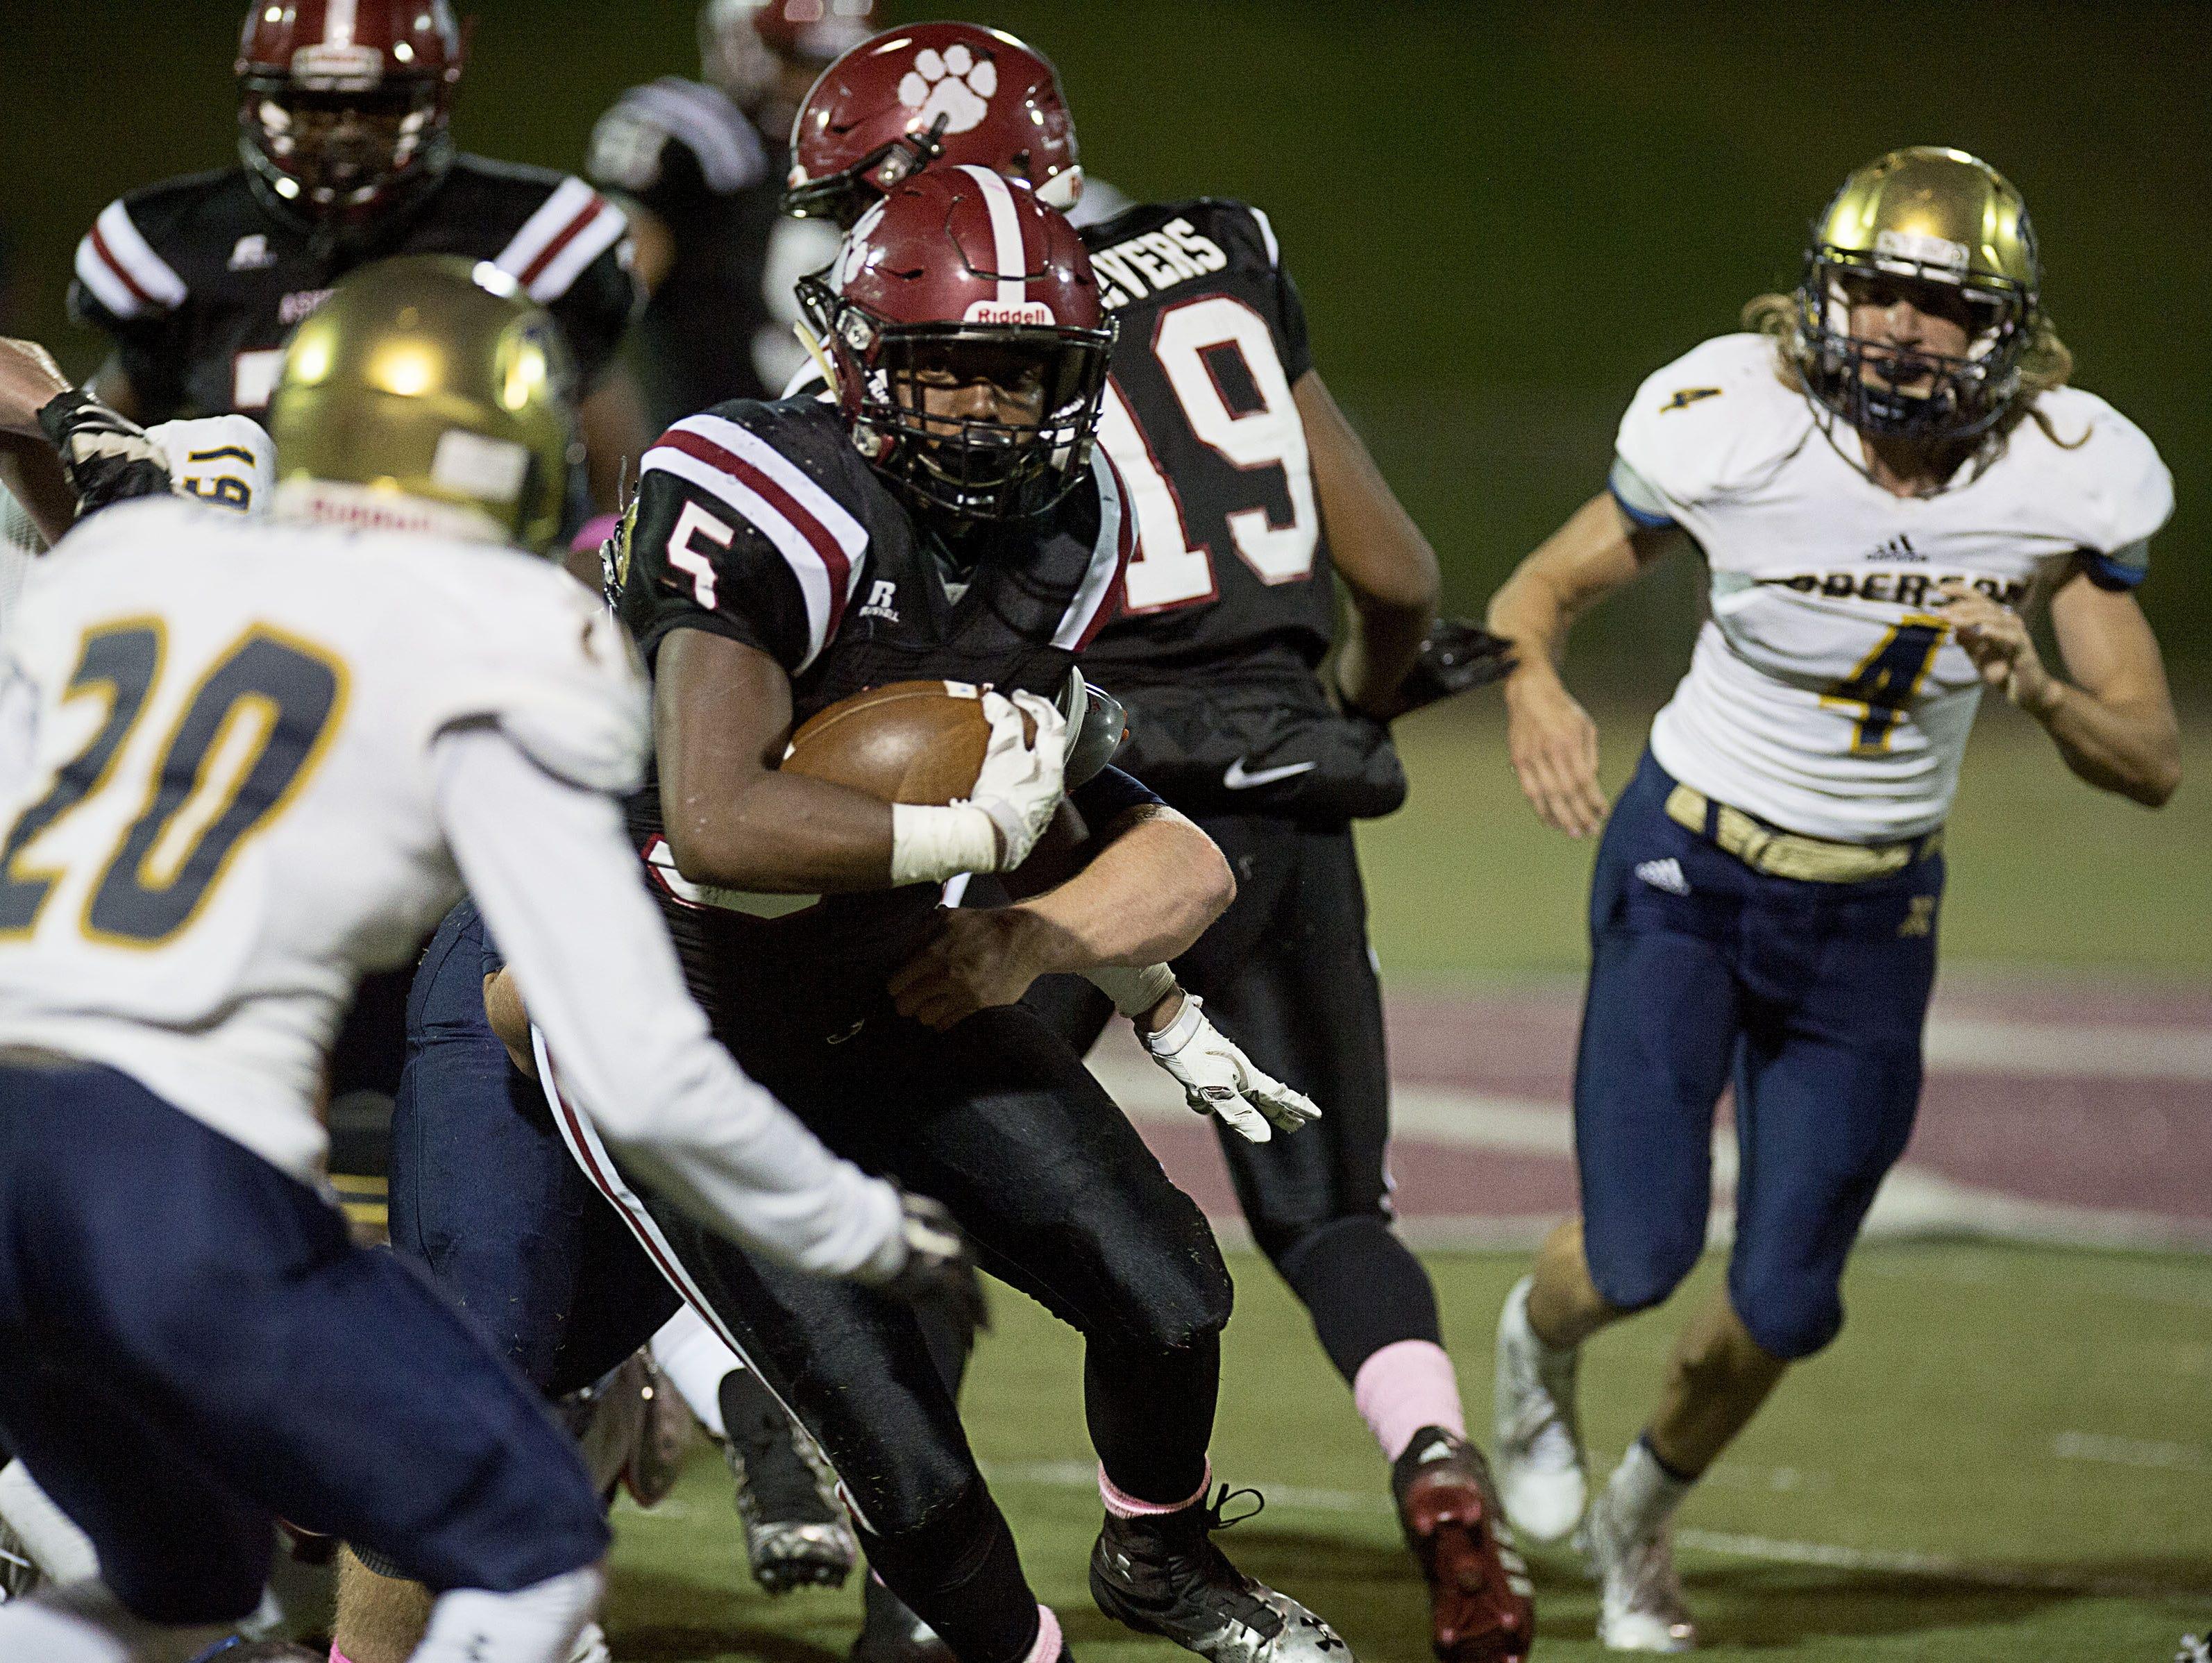 Asheville High's Reggie Battle weaves through the Roberson defense on Friday.